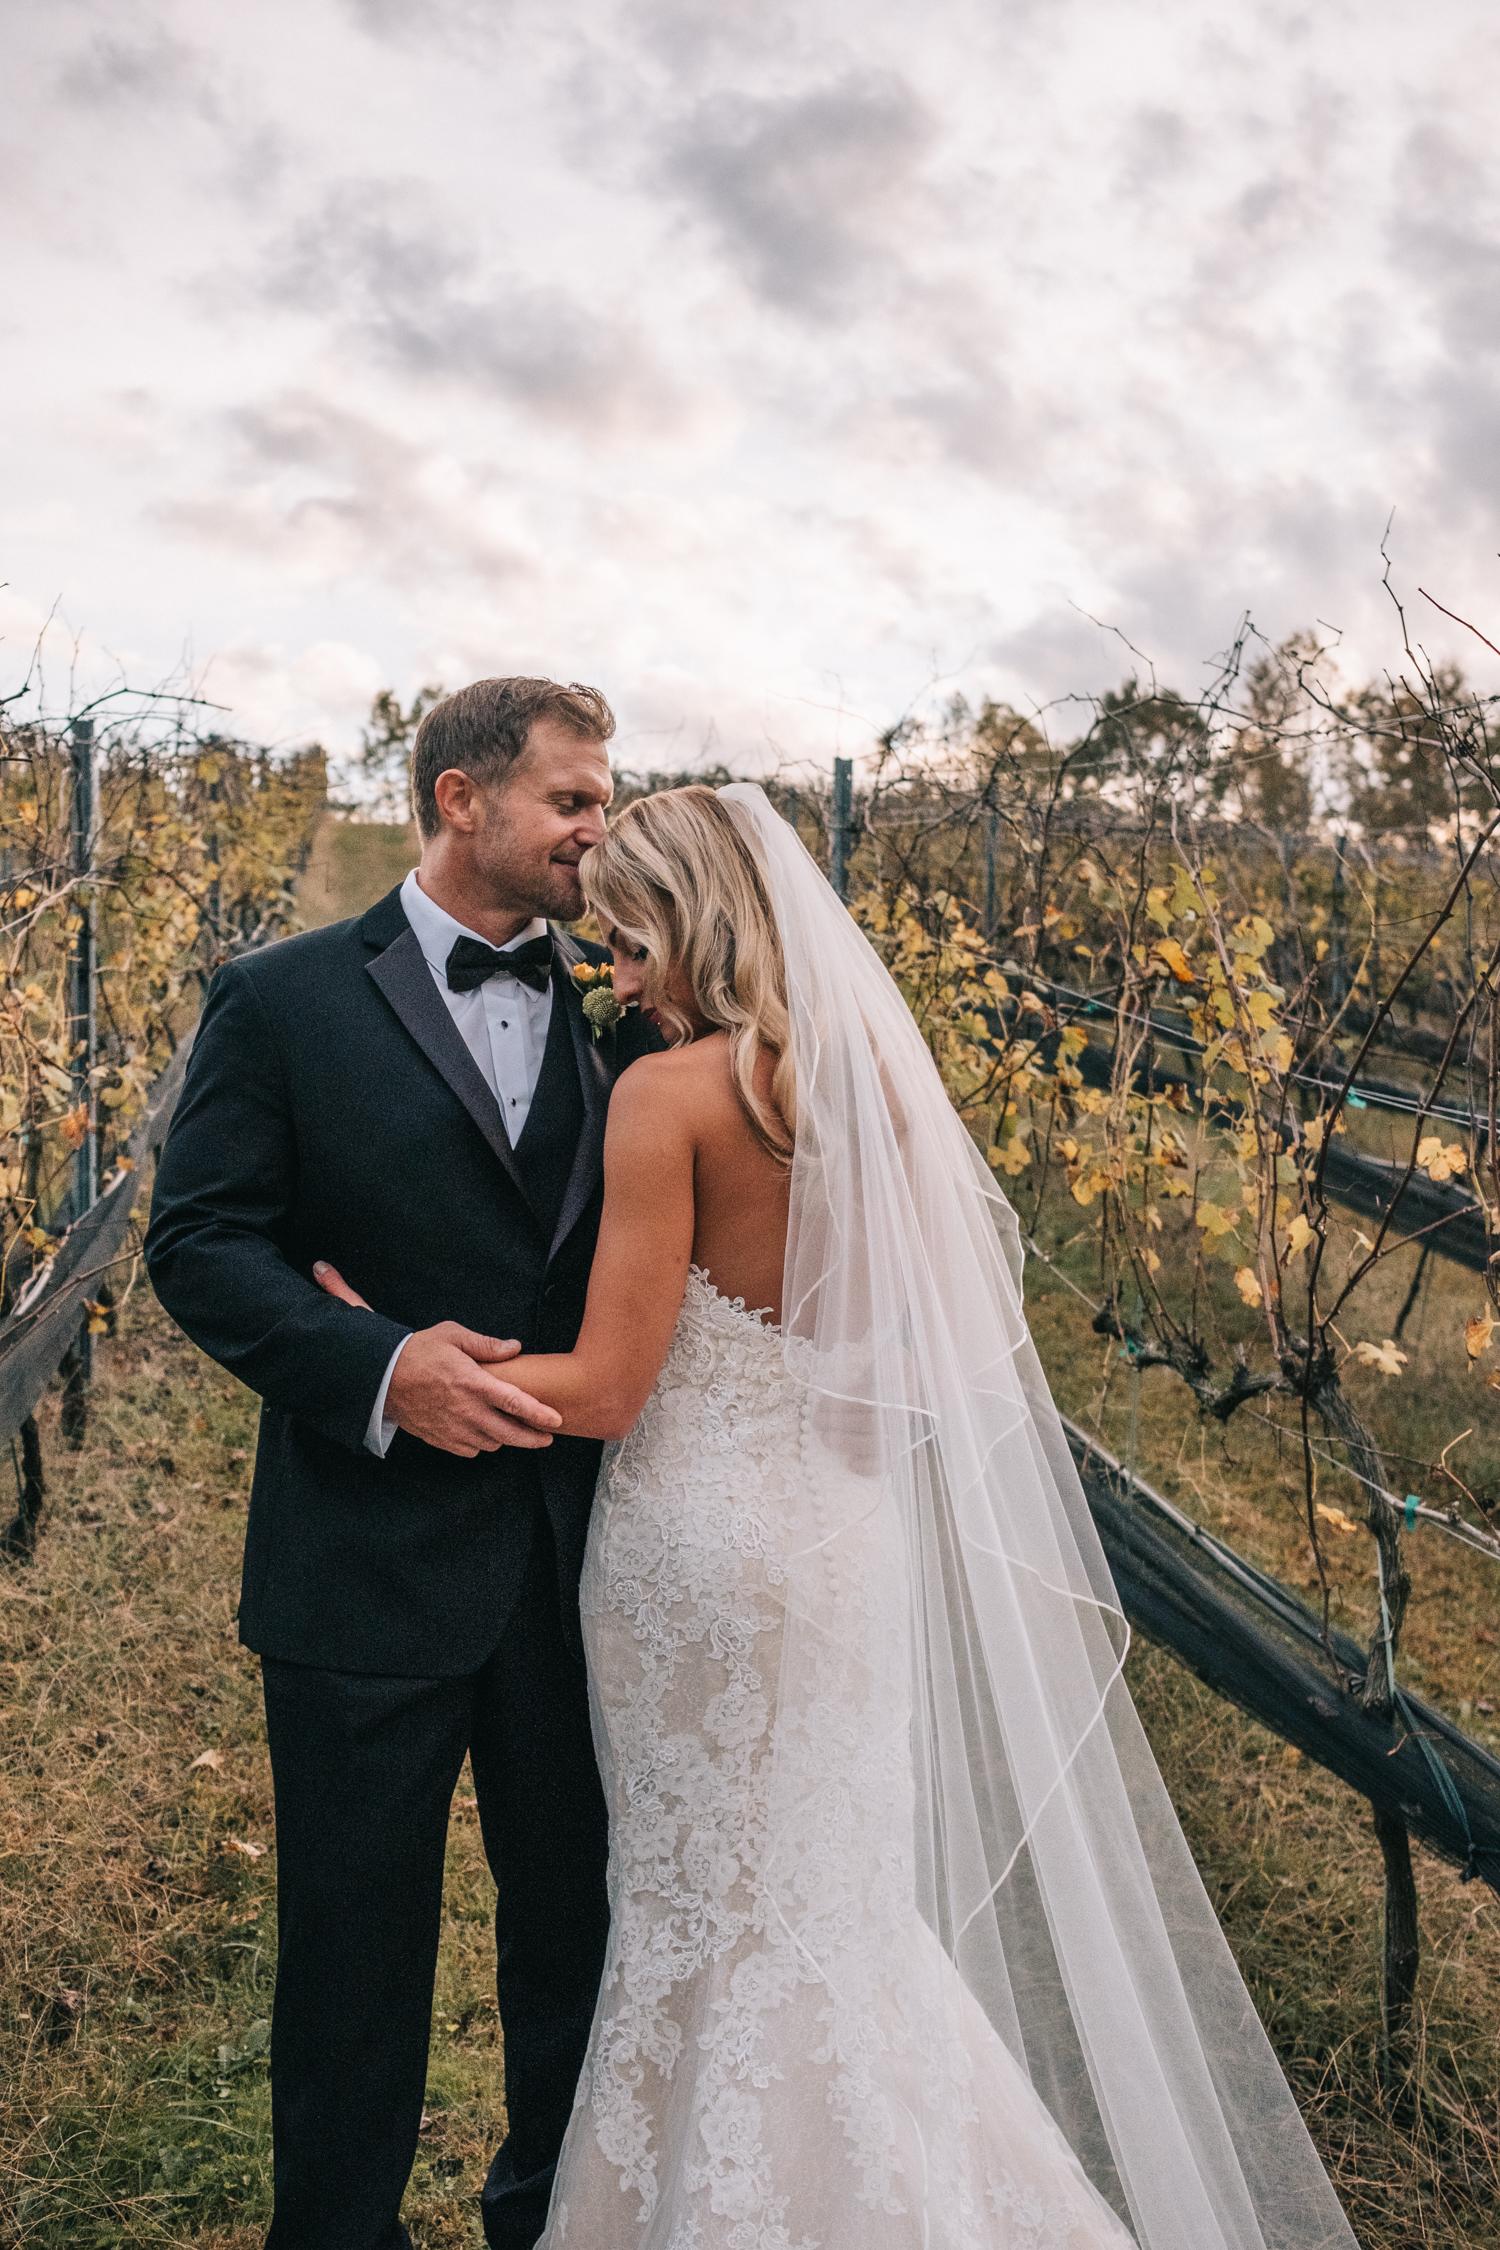 potomac point winery wedding-48.jpg